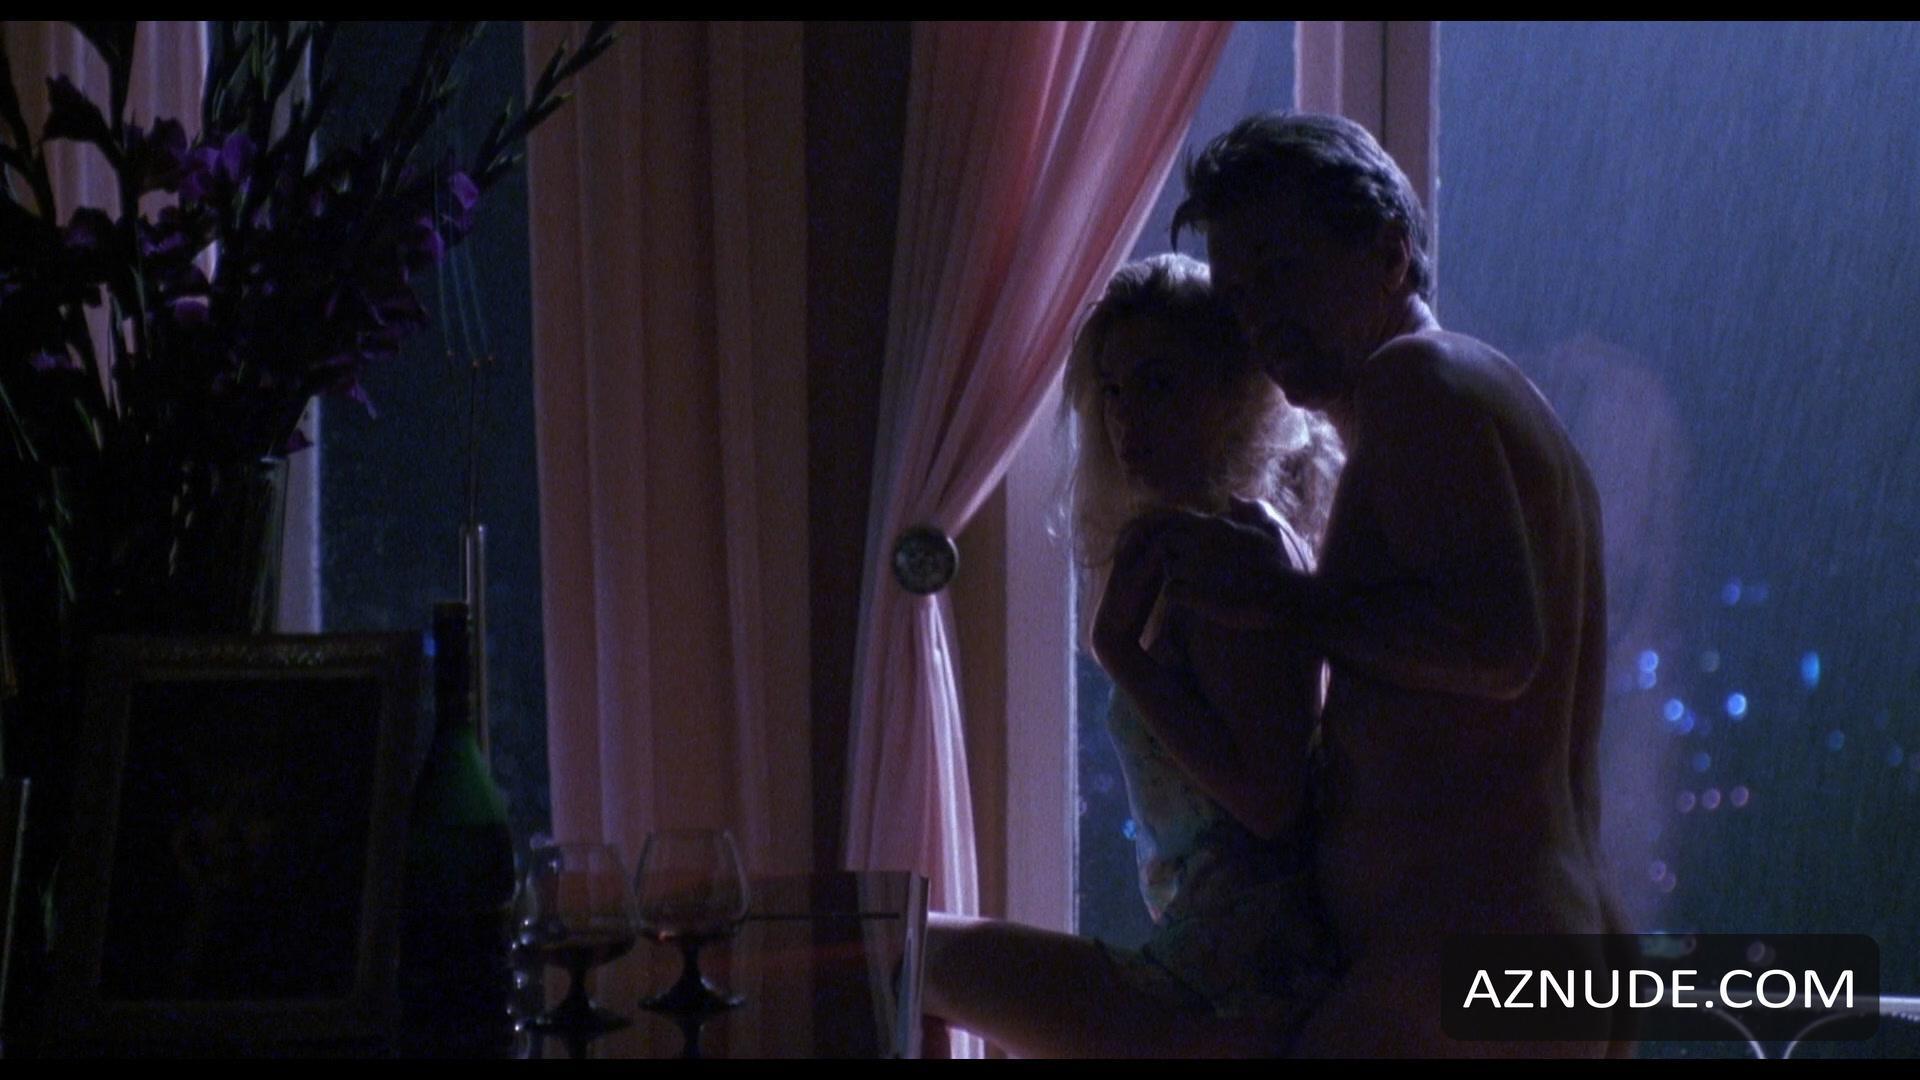 Drew barrymore hot sex scene